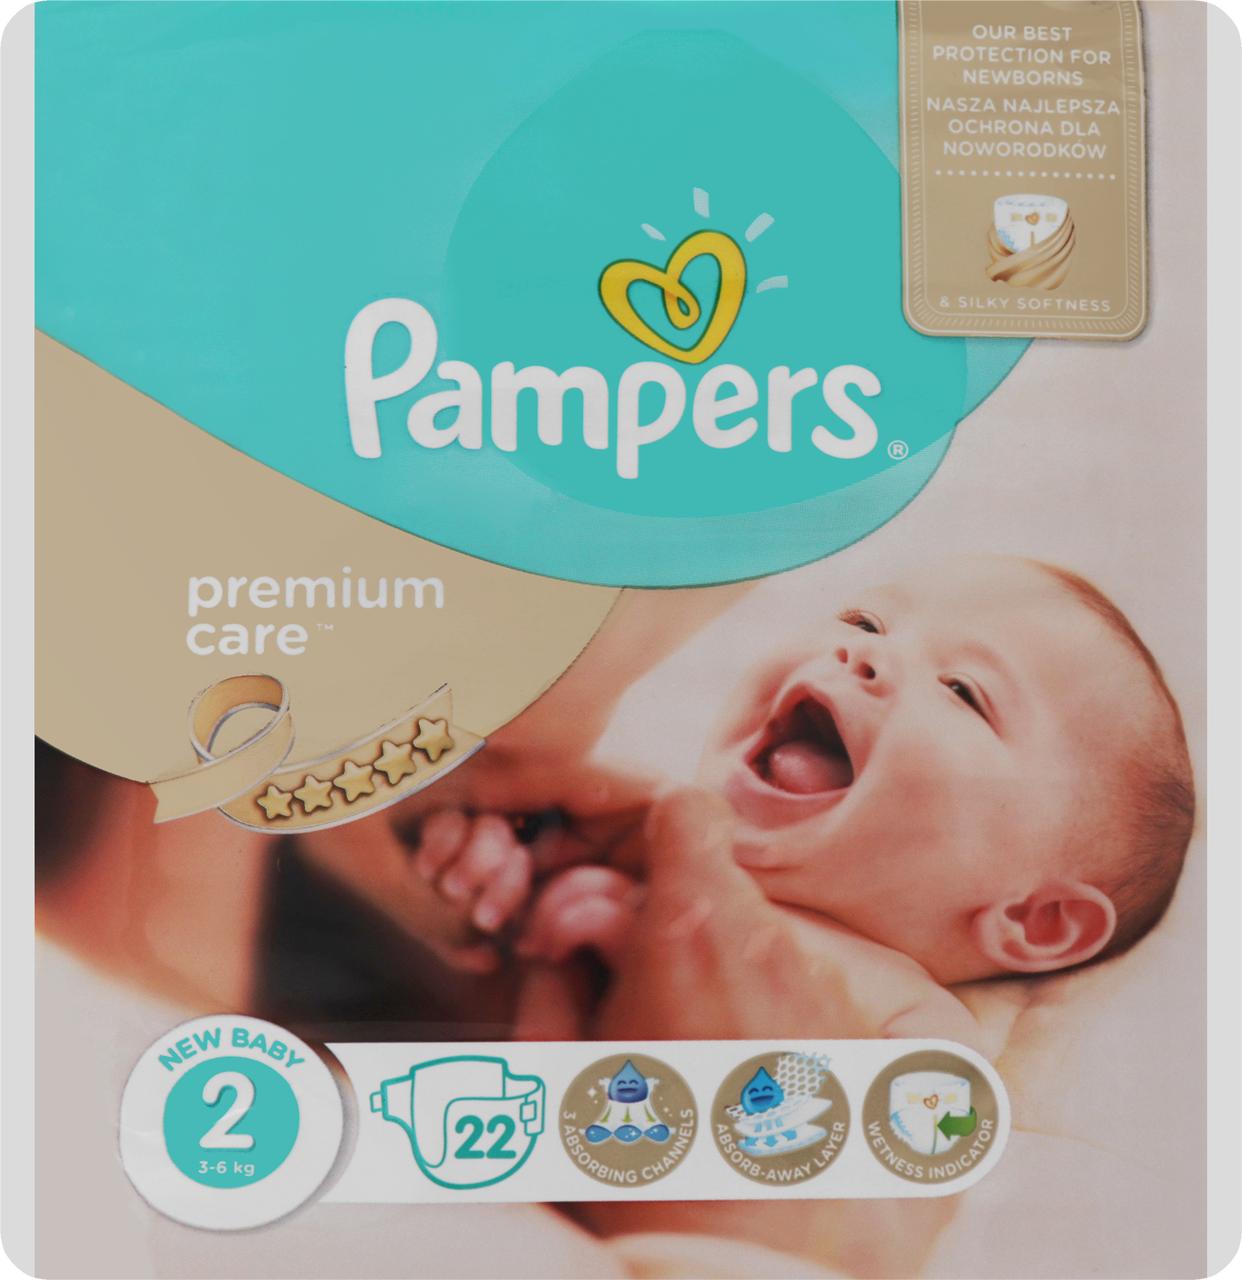 Пiдгузки Pampers Premium Care Mini 2 для дітей 4-8кг 23шт